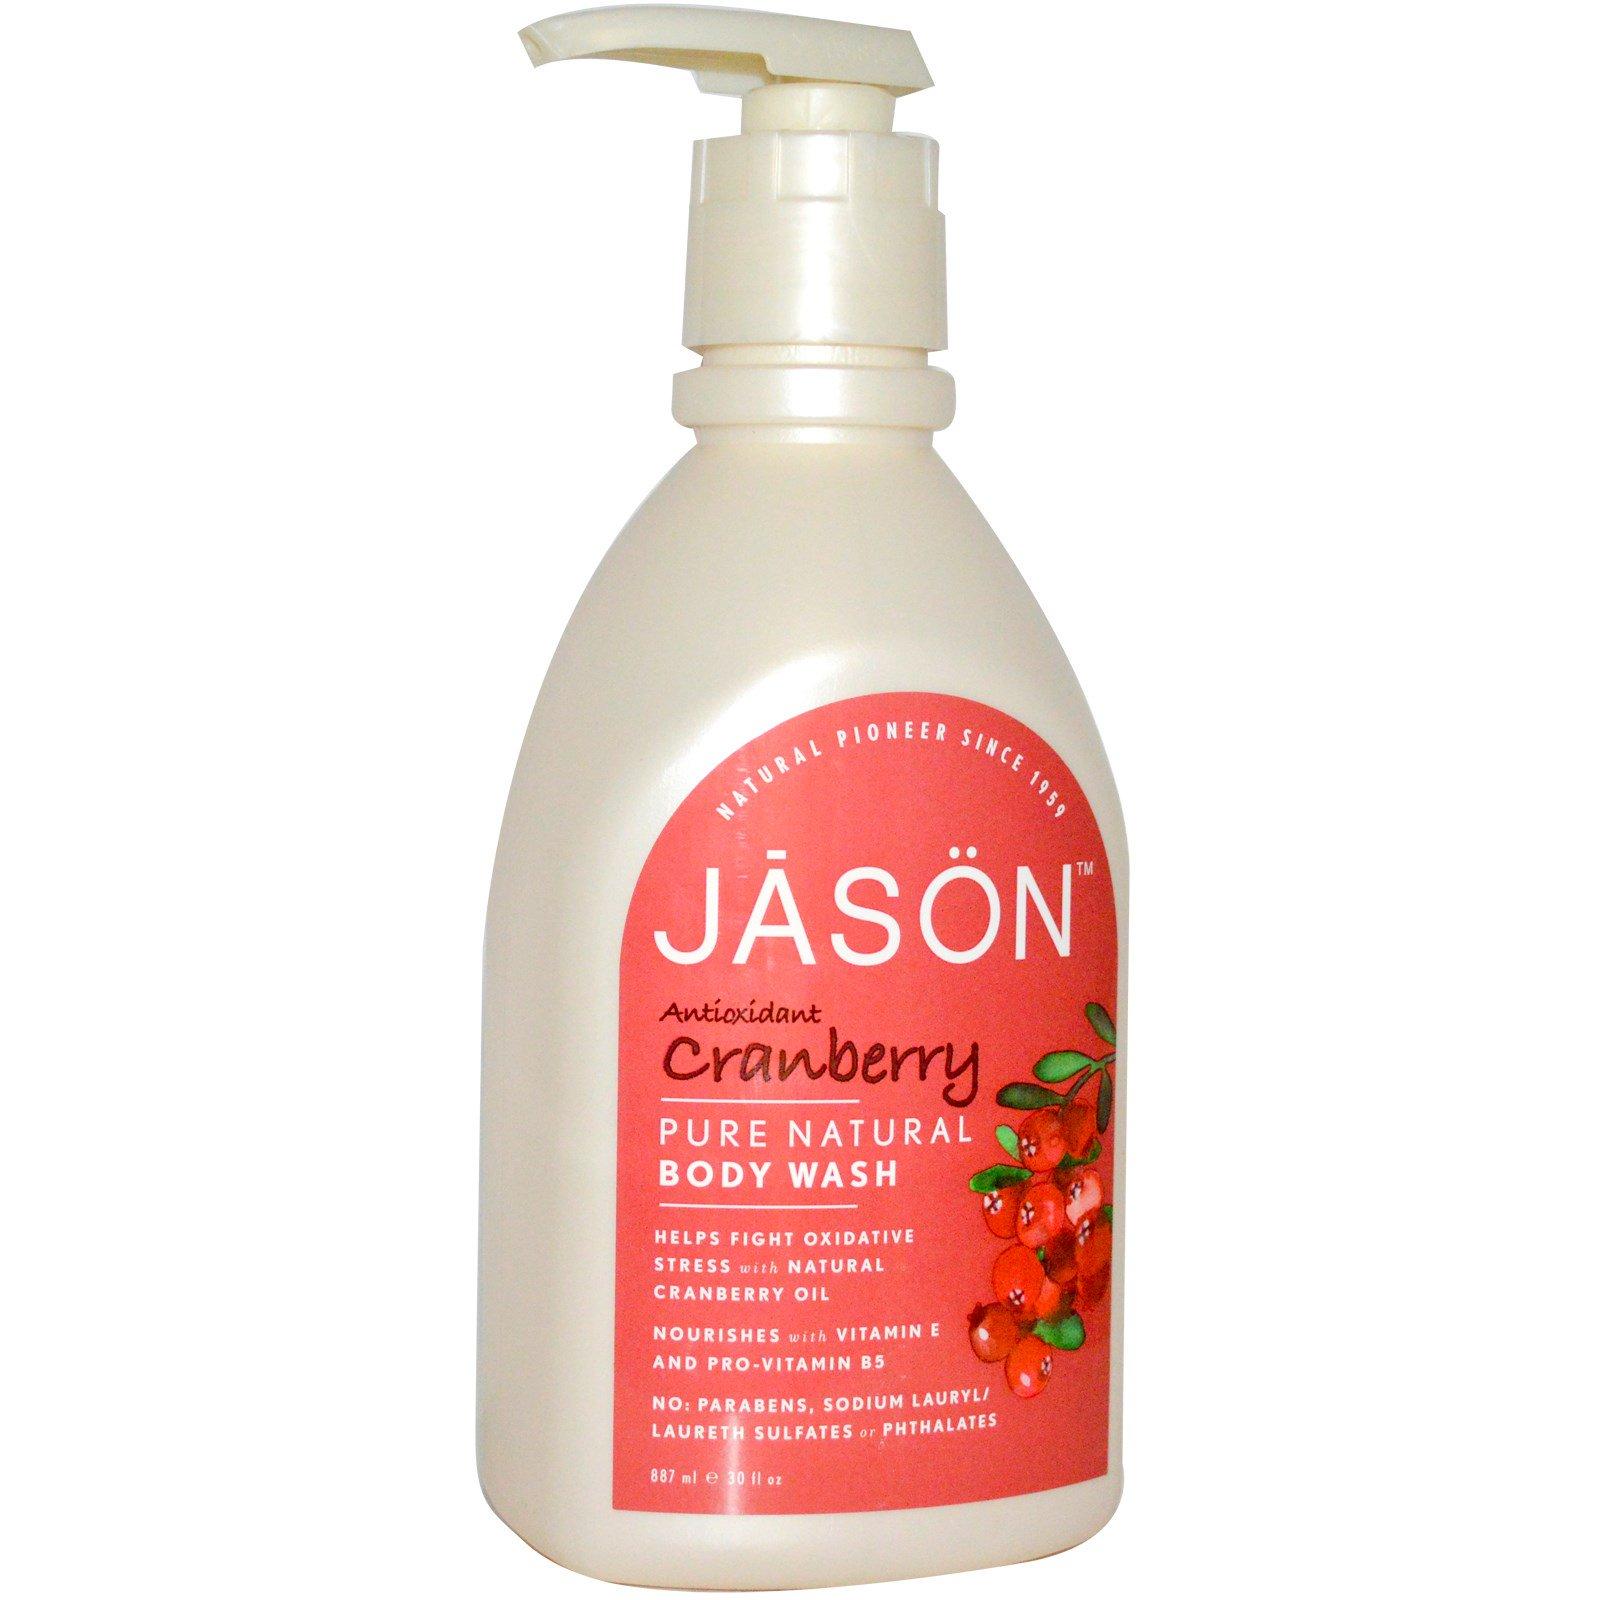 Jason Natural, Чистый натуральный гель для душа, антиоксидантная клюква, 887 мл